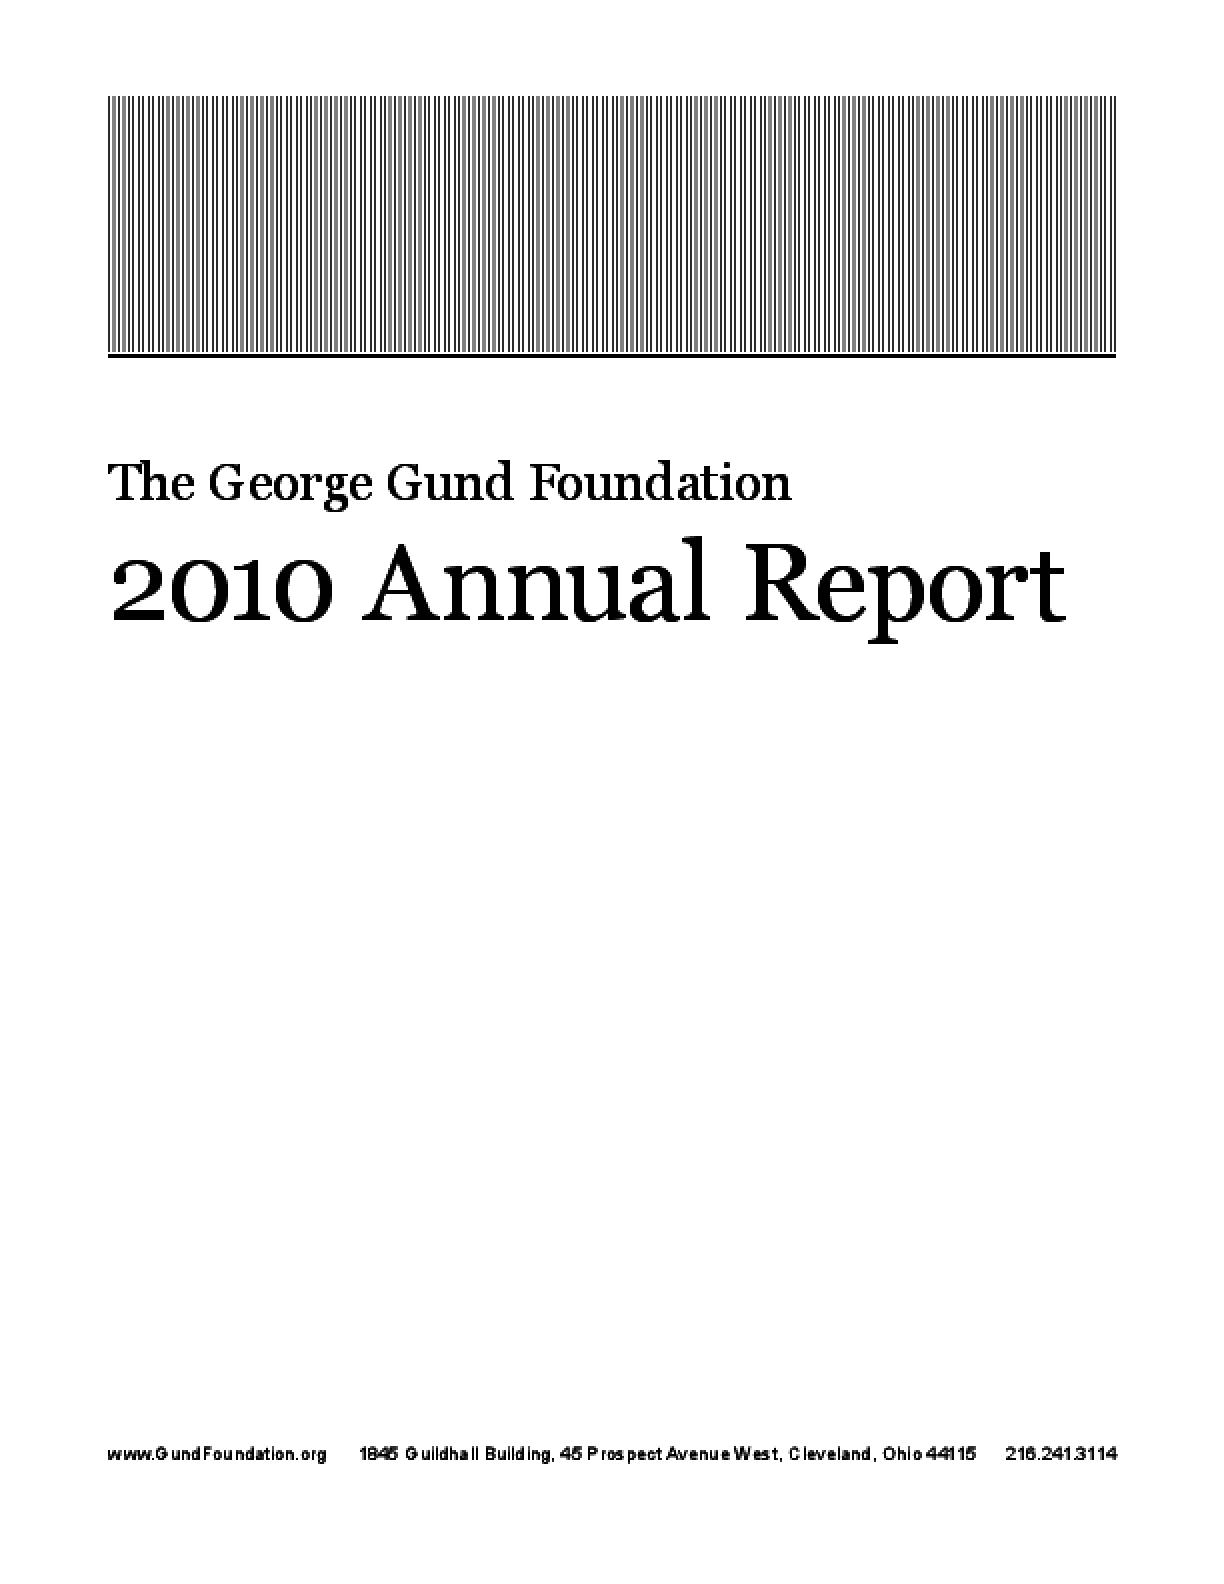 George Gund Foundation 2010 Annual Report